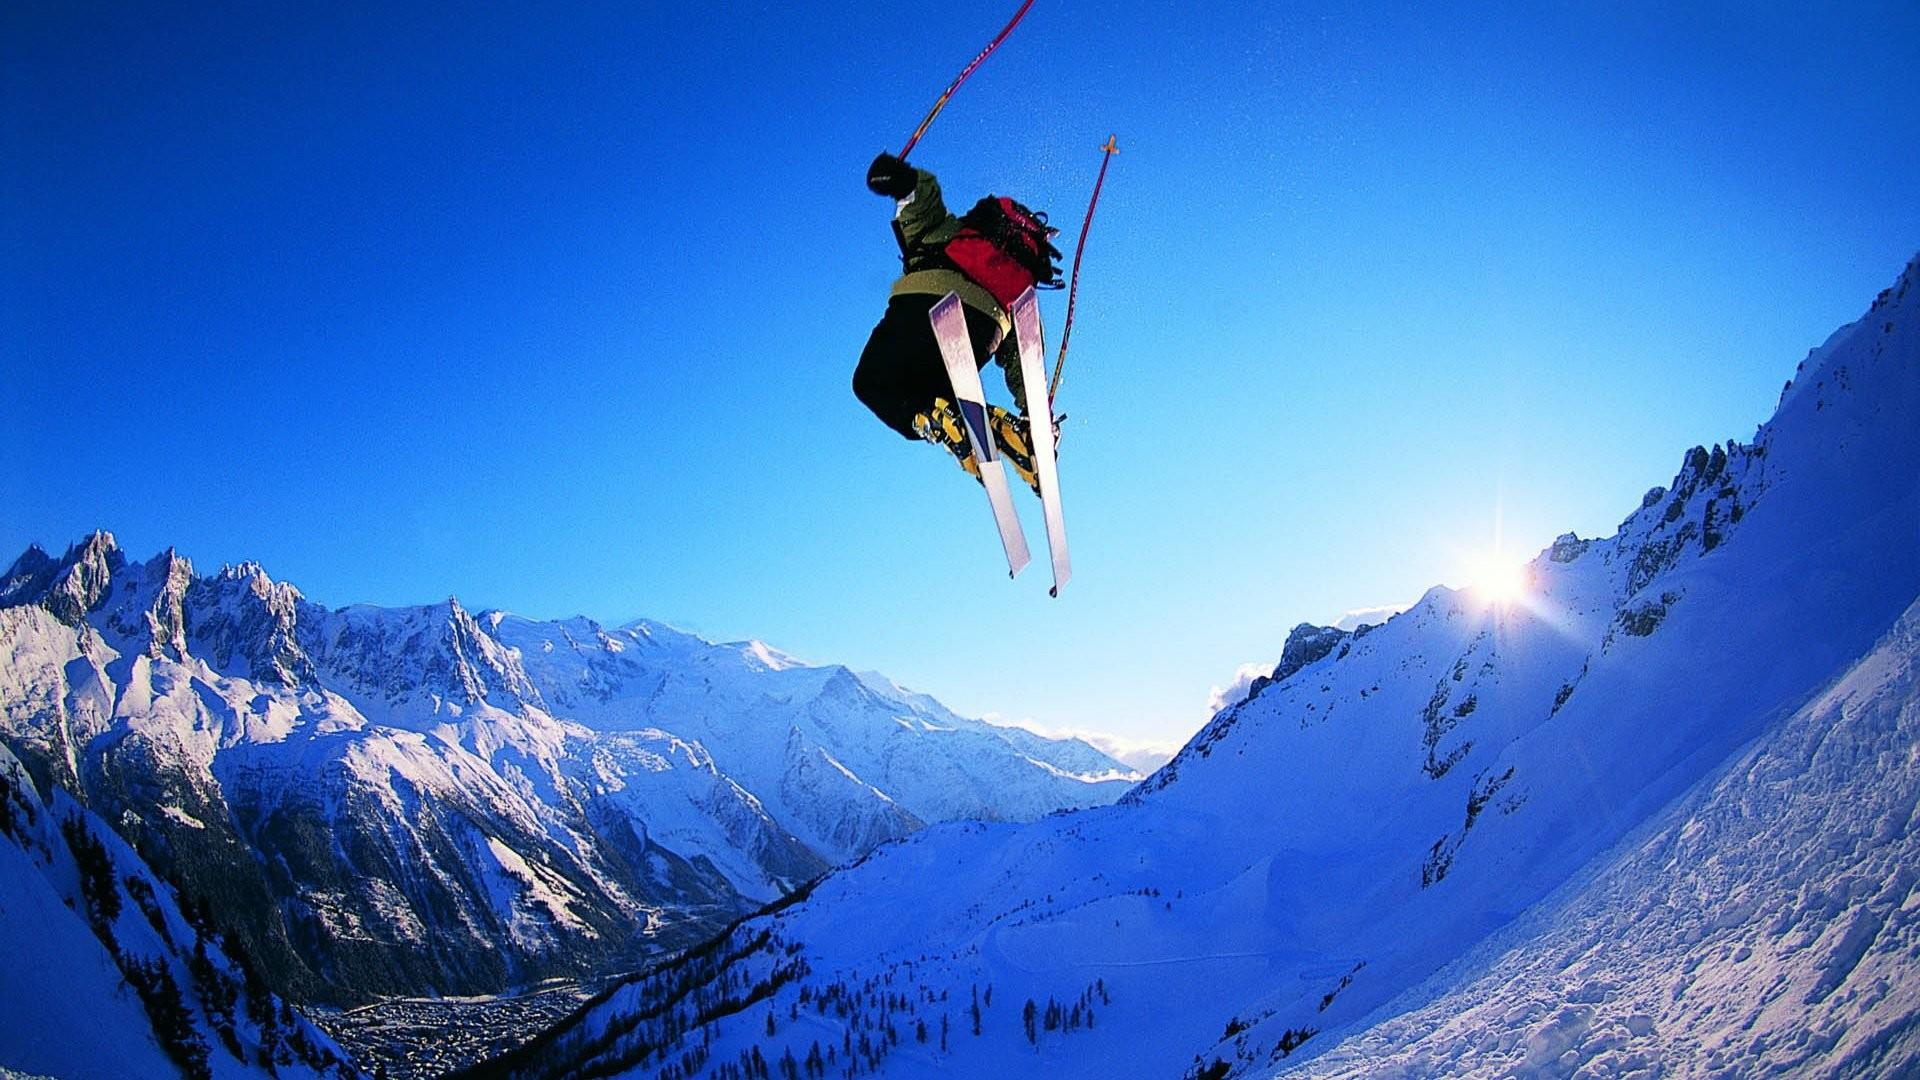 Snowboarding Wallpapers For Desktop 69 Images